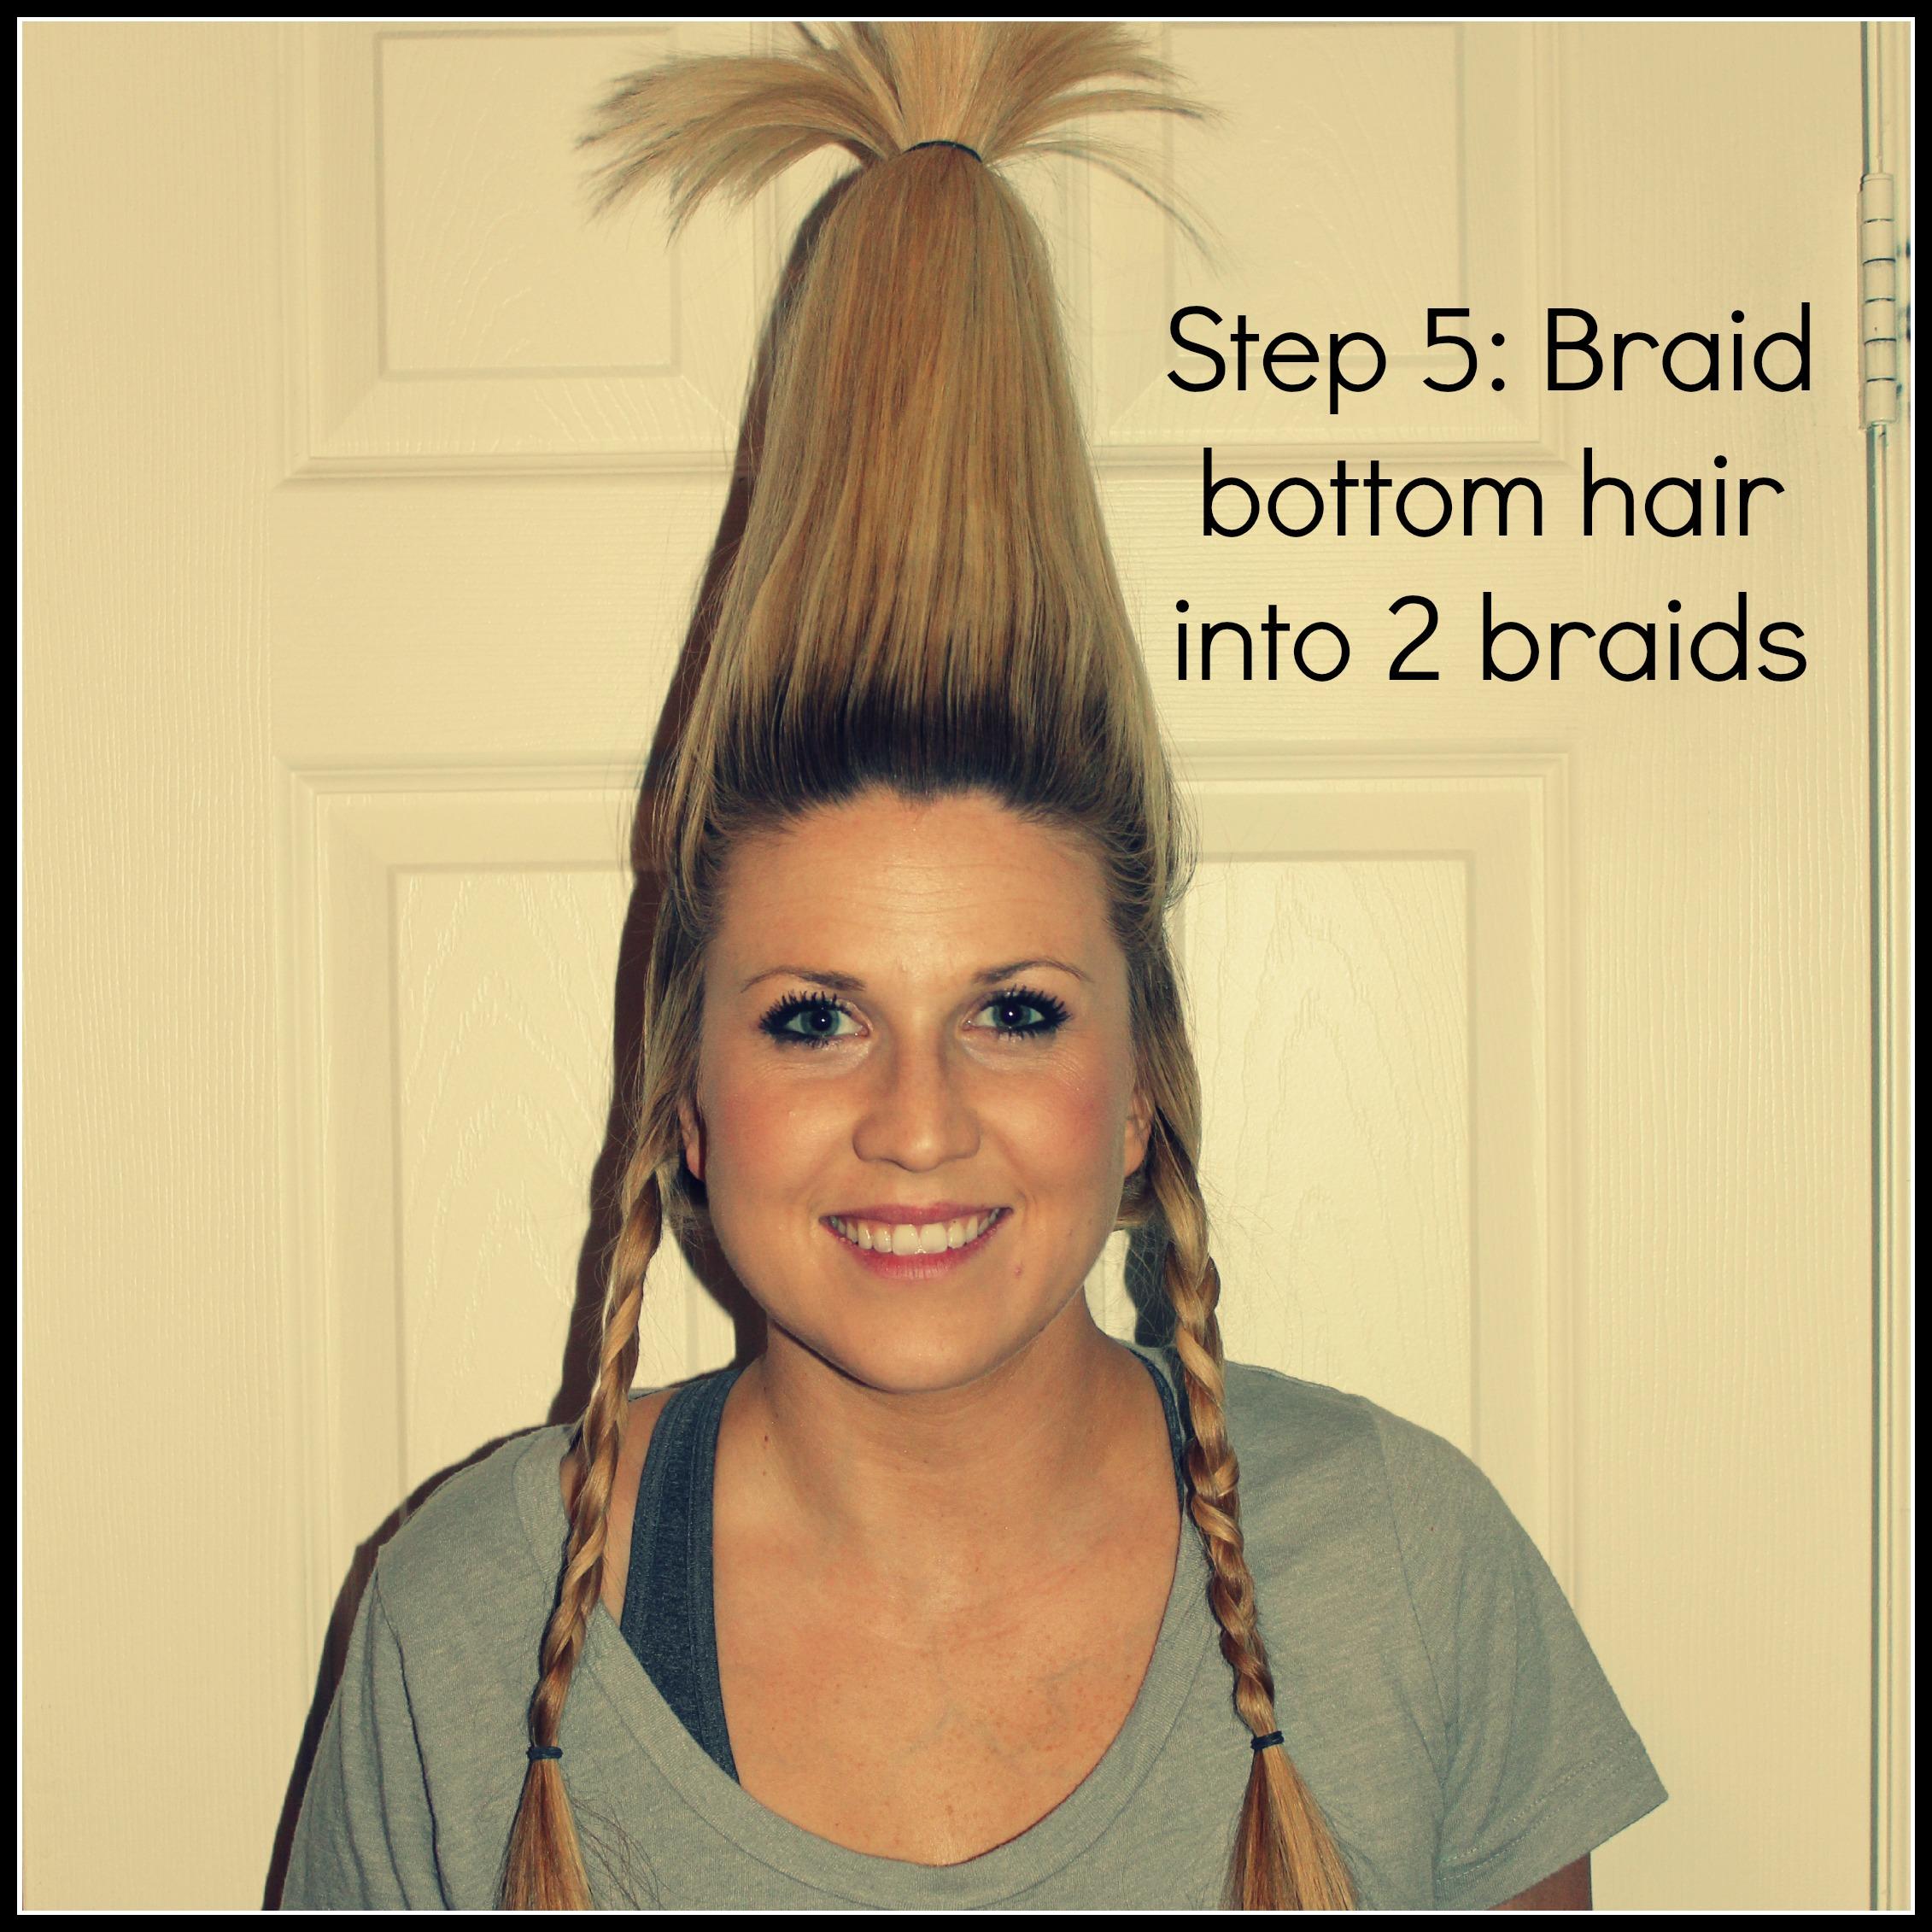 Hairfinal Hair1 Hair2 Hair3 Hair4 Hair5 Hair6 Hair7